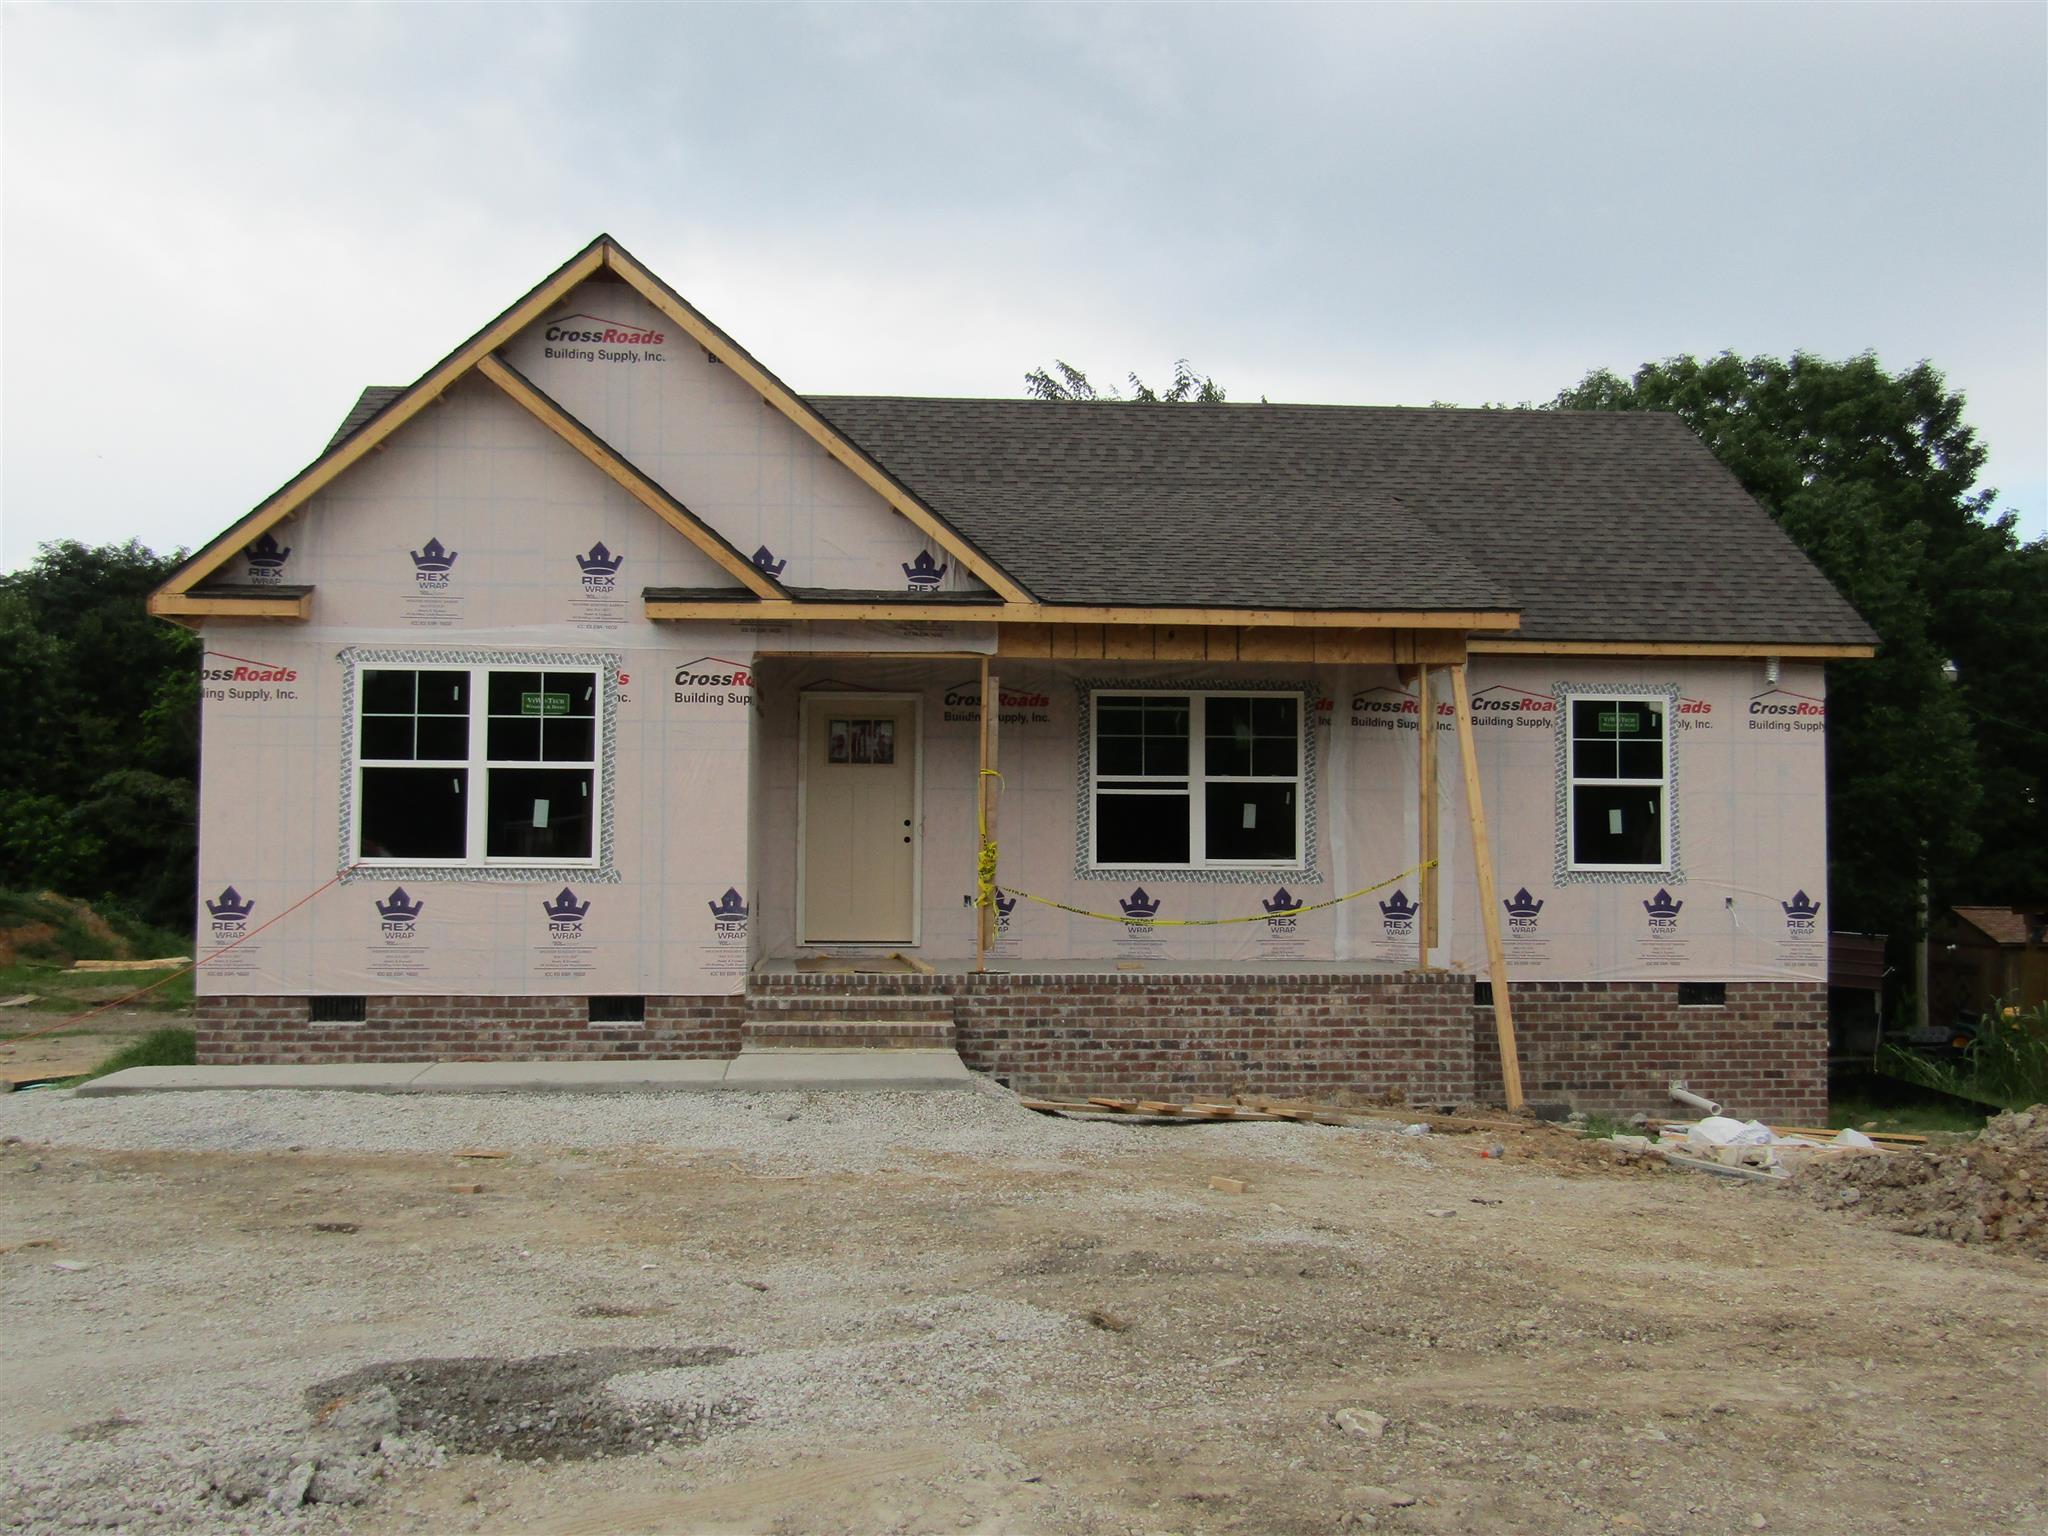 185 Freeman Dr, Lewisburg, TN 37091 - Lewisburg, TN real estate listing